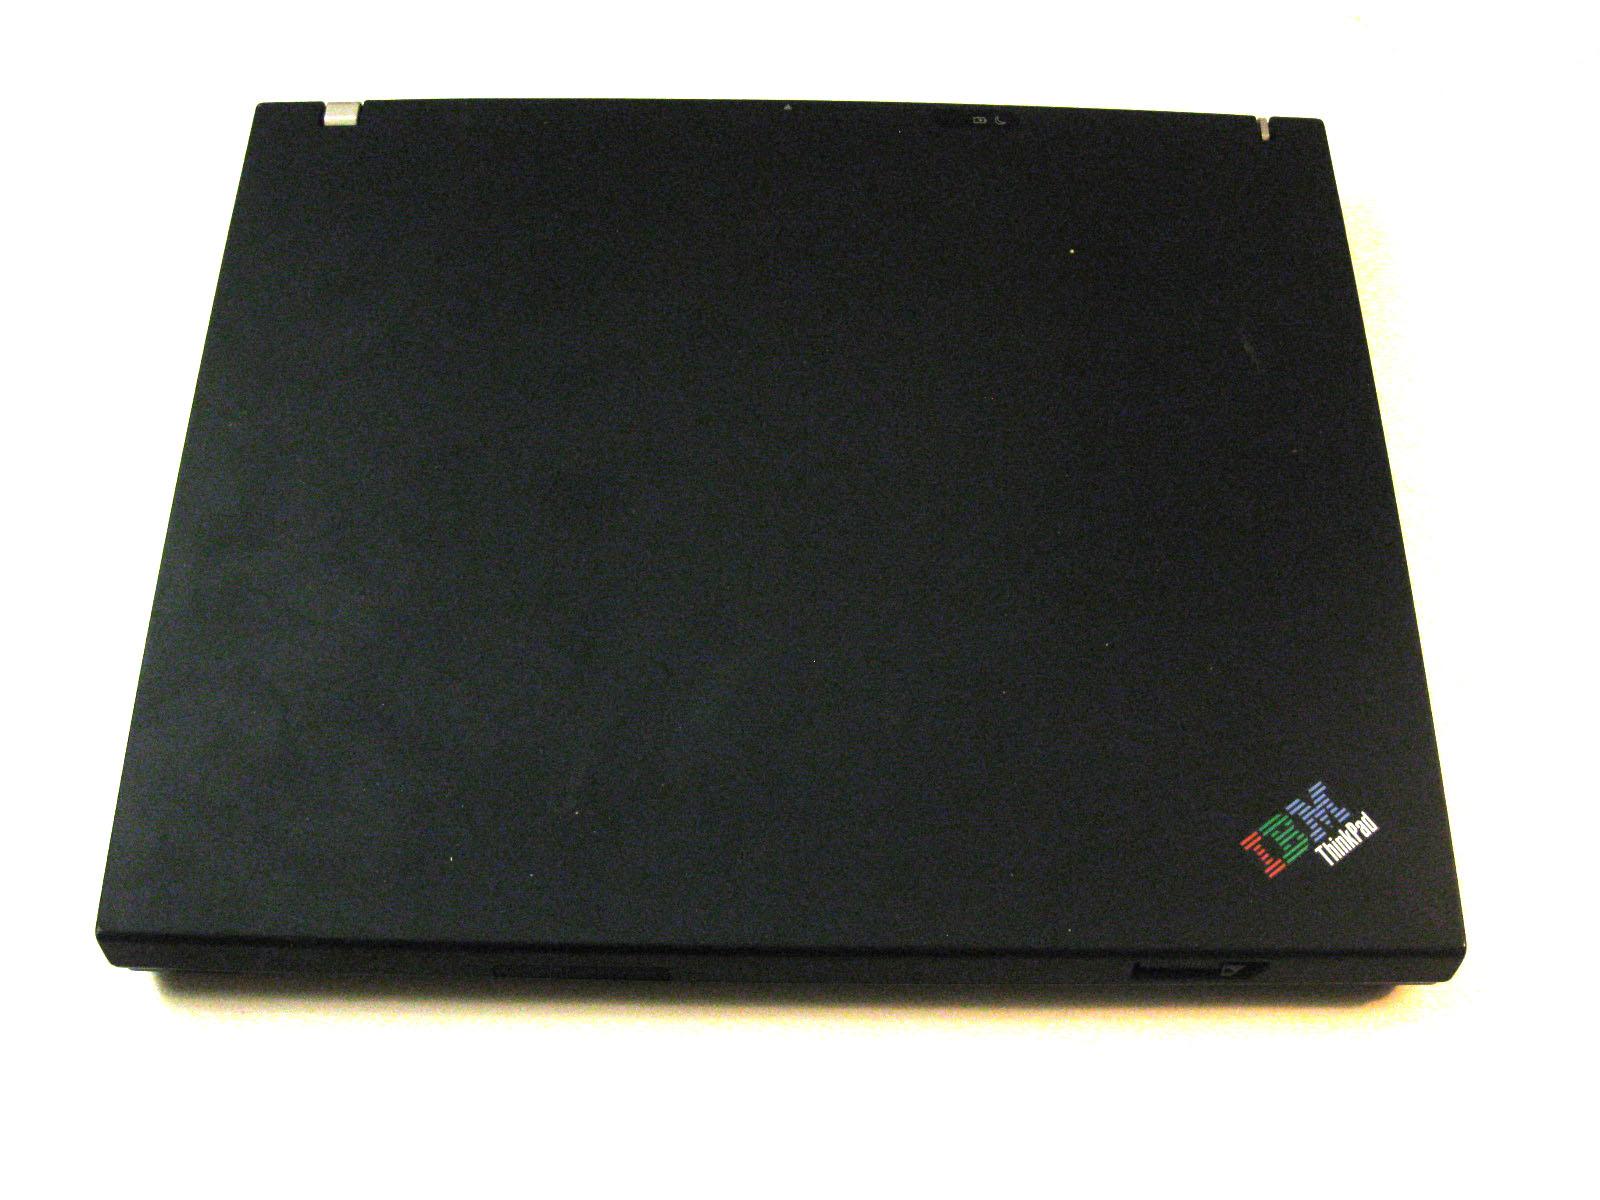 Disassembling IBM ThinkPad T42 Lower Bracket · Complete Disassembly